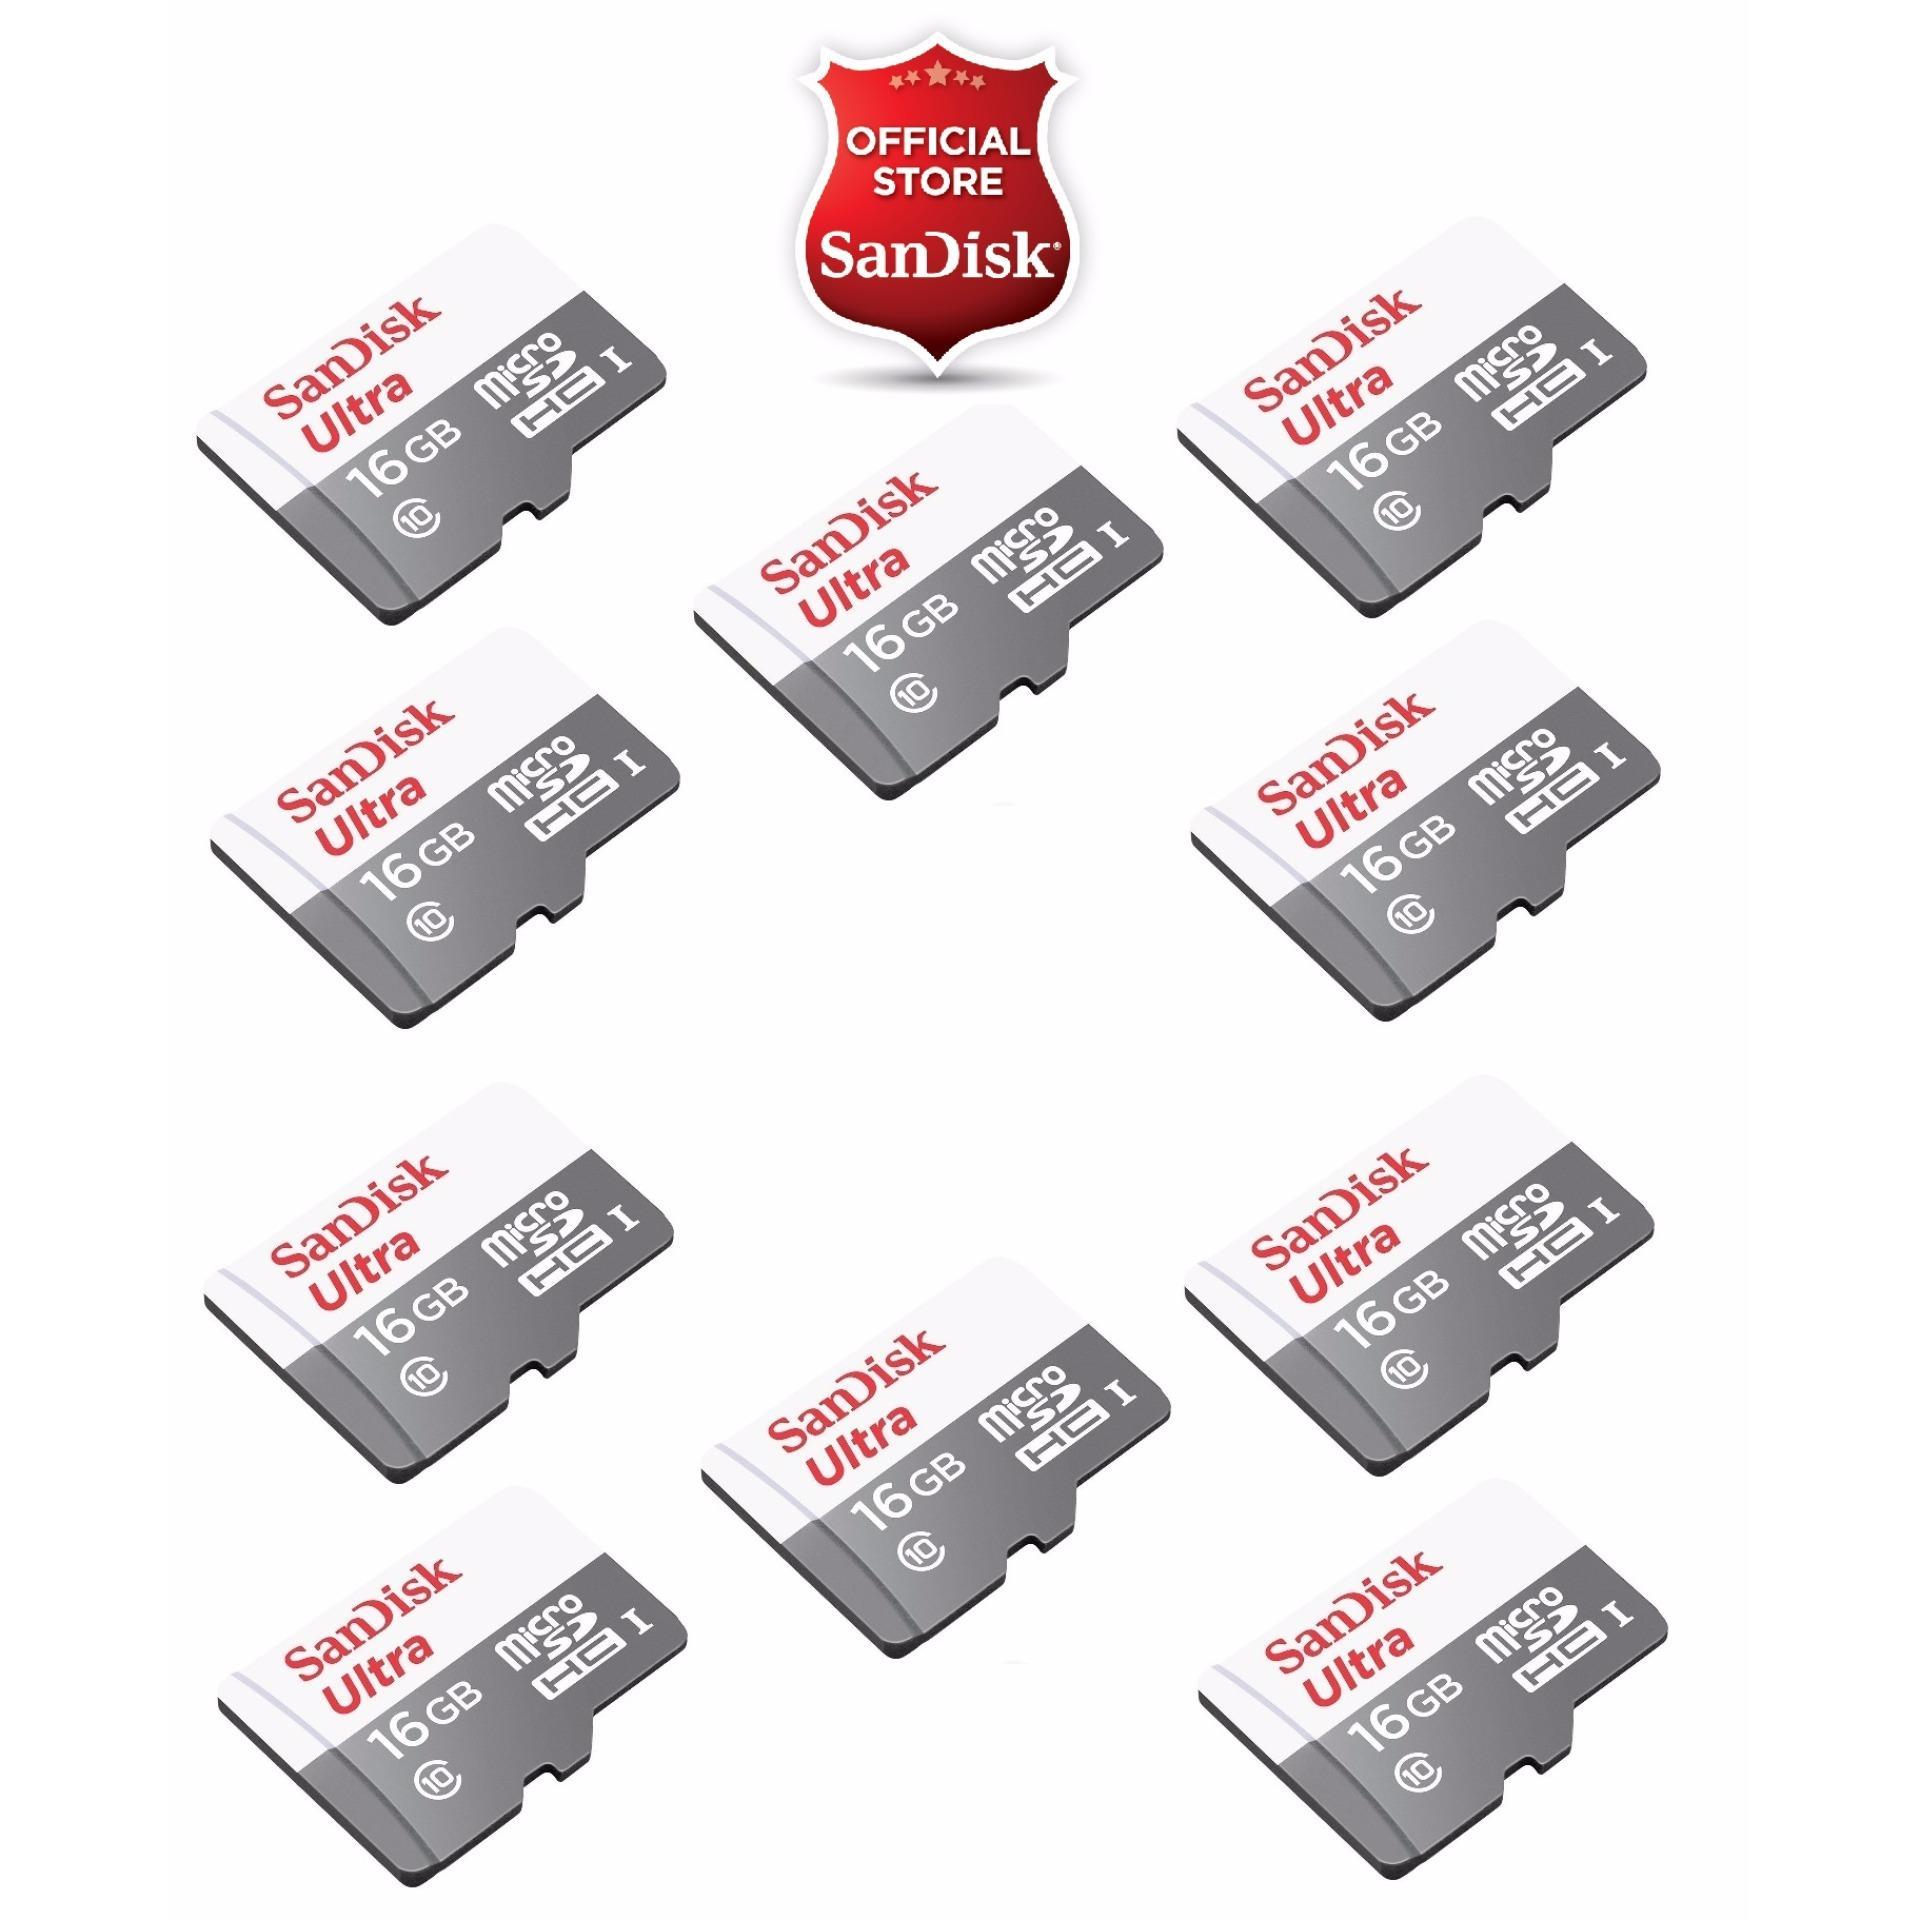 Jual Sandisk Ultra Microsd 16gb 80mb S No Adapter Termurah 2018 Micro Sd 32gb Class 10 Garansi Resmi Philippines Sdhc Uhs I Sdsquns